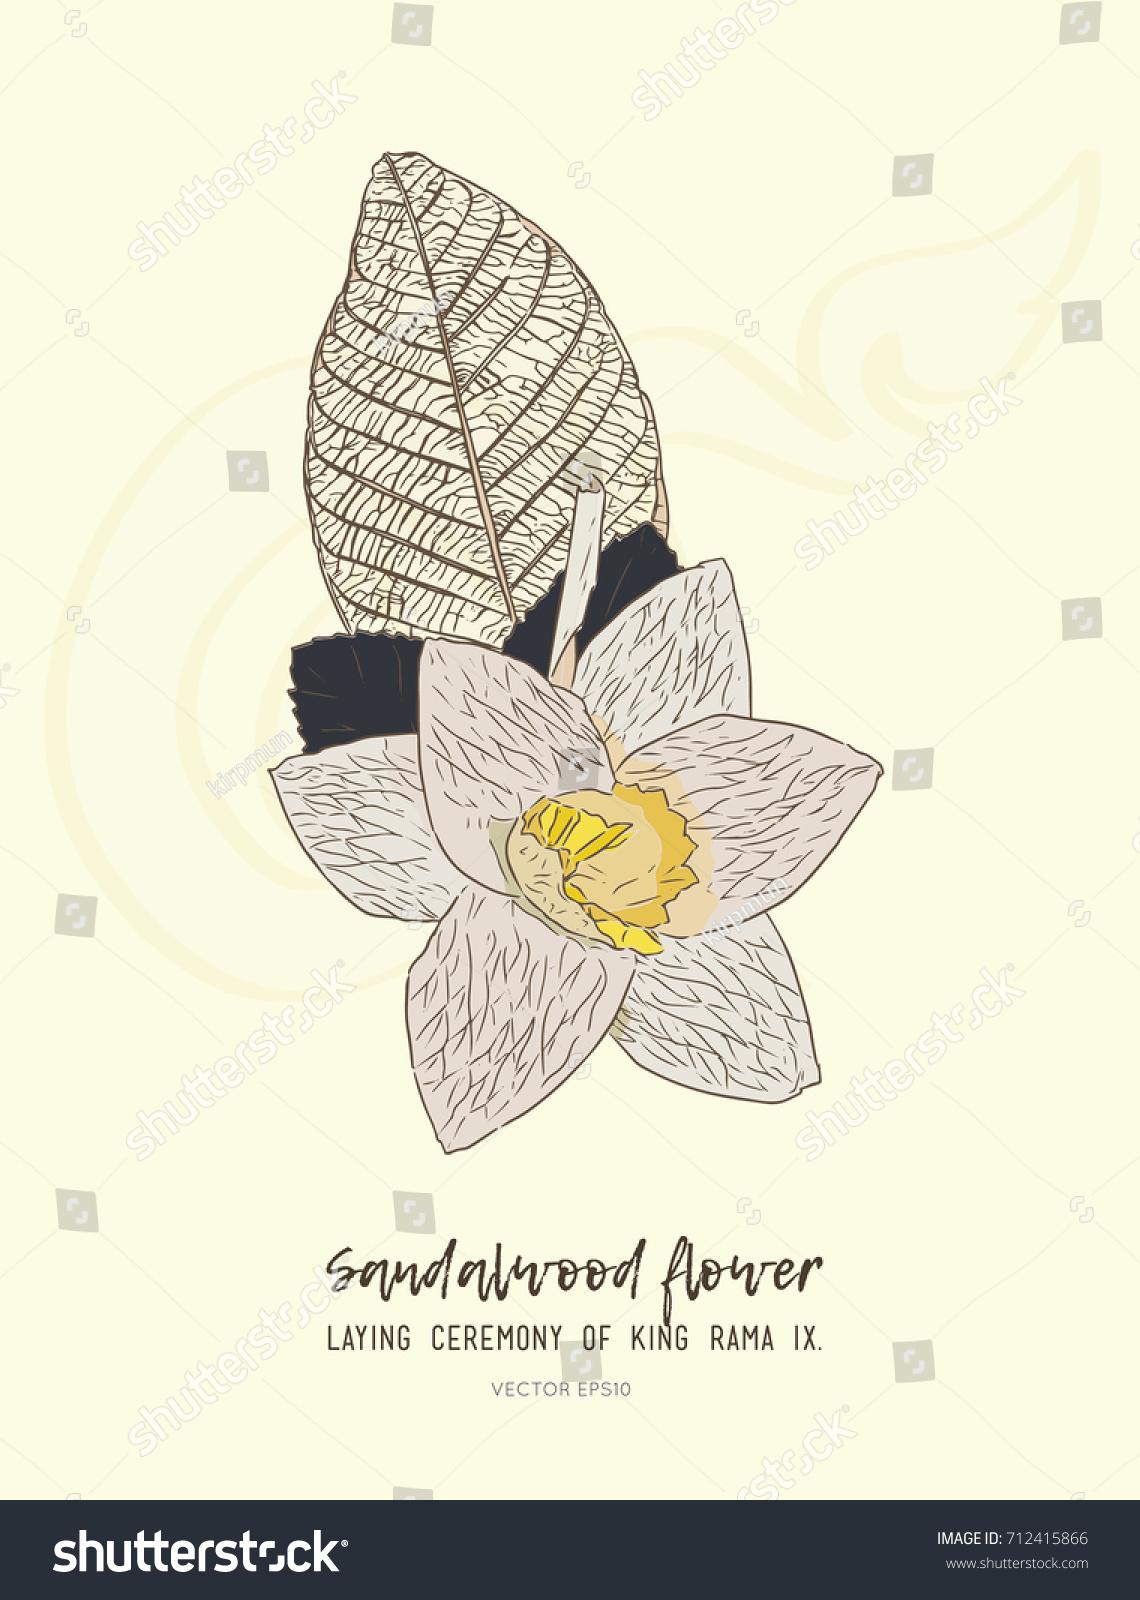 Thai artificial funeral daffodil flower dok stock vector hd royalty thai artificial funeral daffodil flower or dok mai chan sandalwood flower laying ceremony for izmirmasajfo